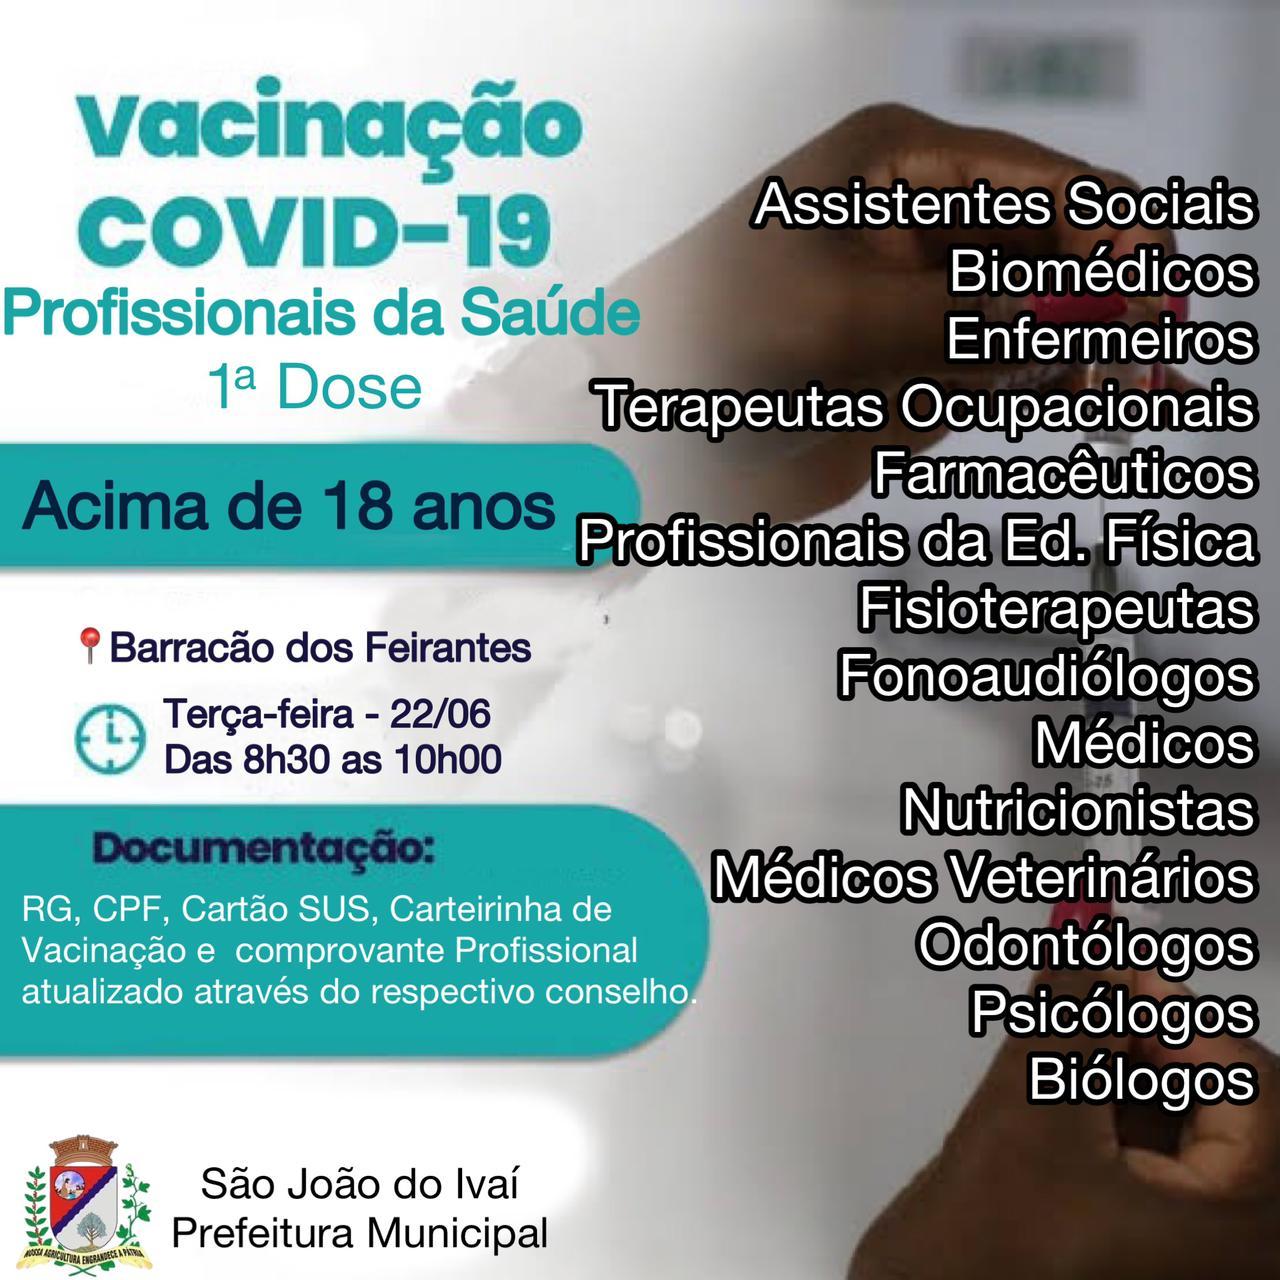 vacina��o profissionais